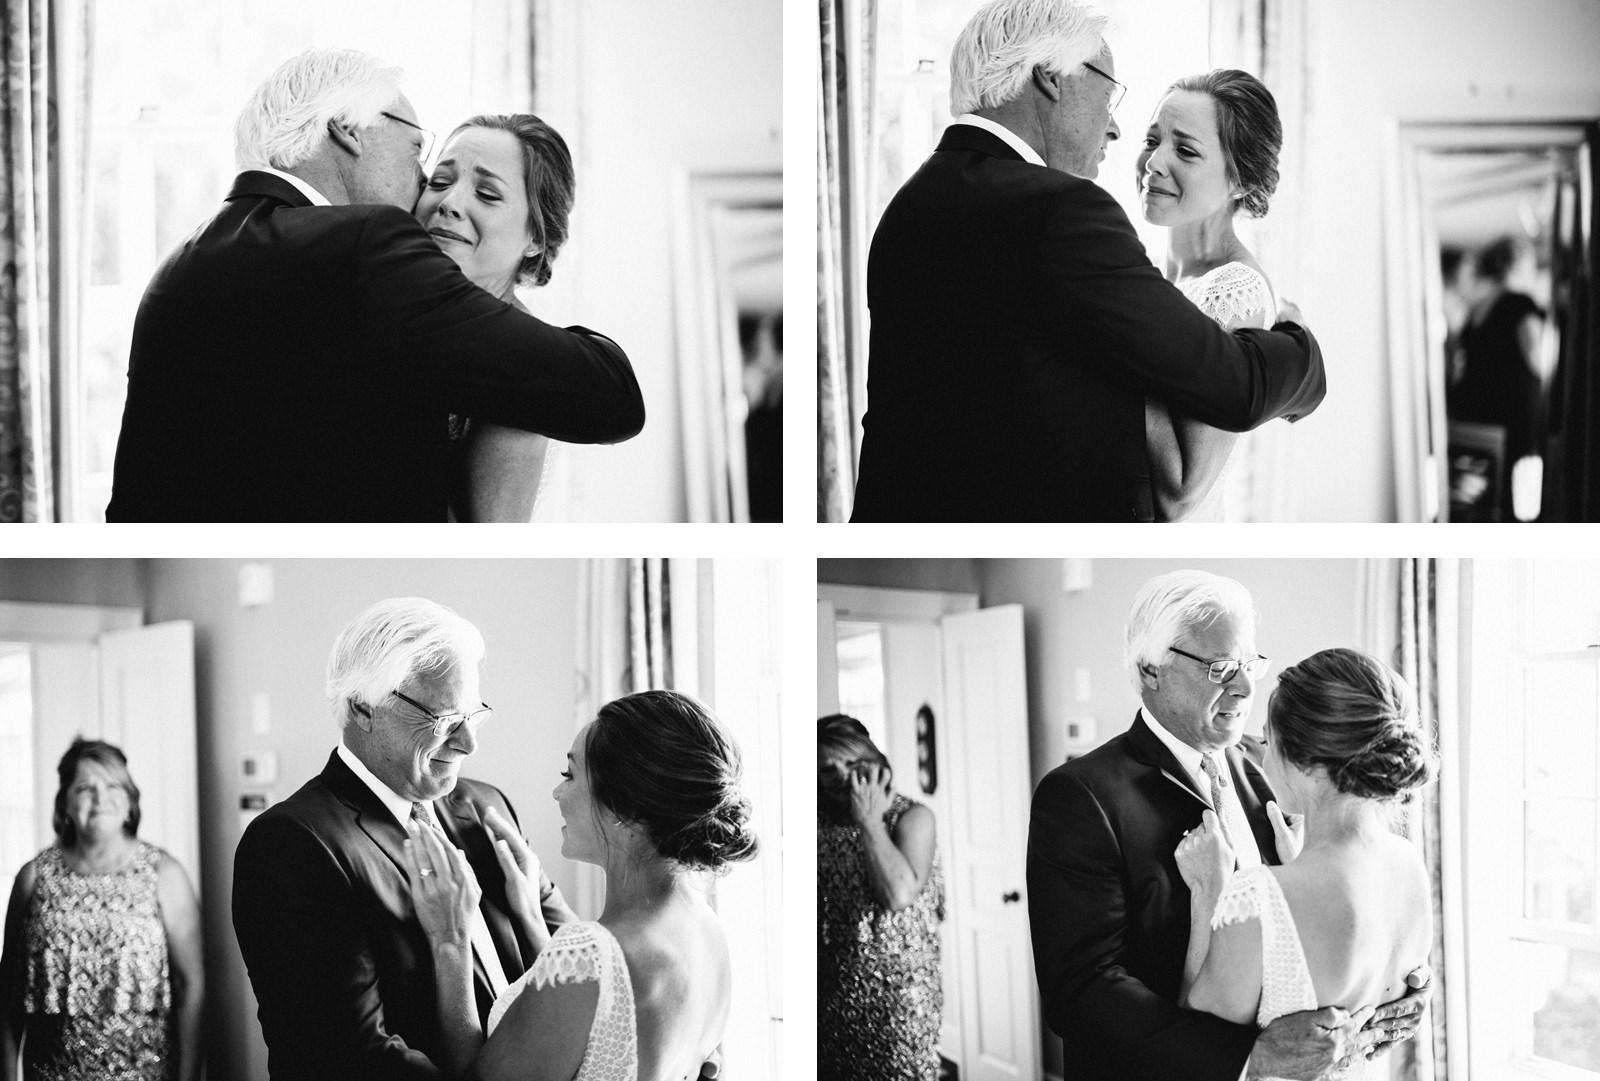 bridgeport-wedding-026 BRIDGEPORT, CONNECTICUT BACKYARD WEDDING